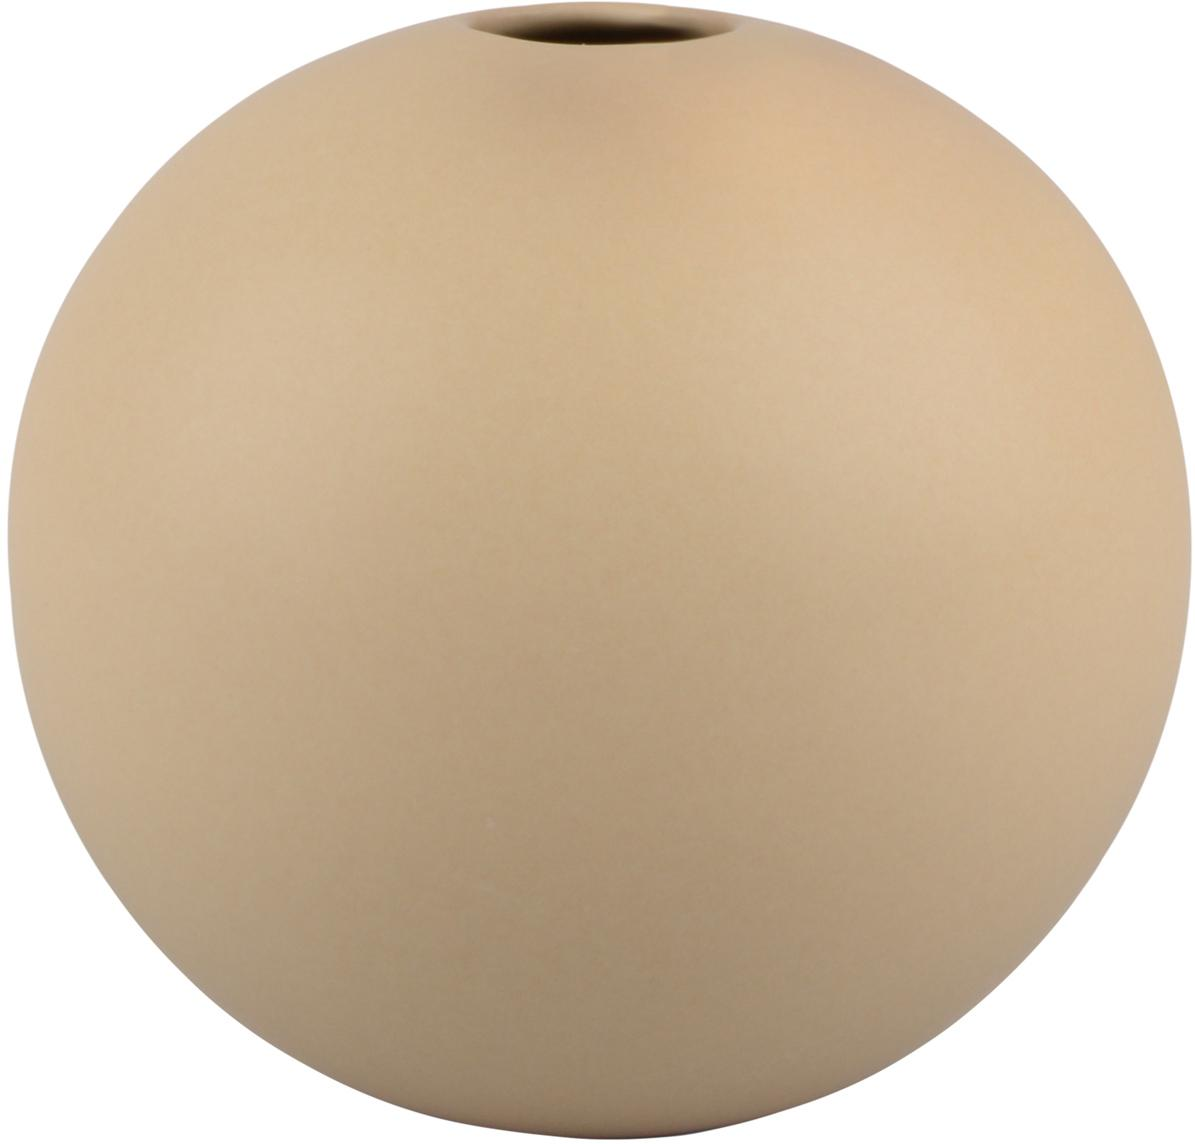 Kugel-Vase Rita aus Keramik, Keramik, Beige, Ø 12 x H 12 cm